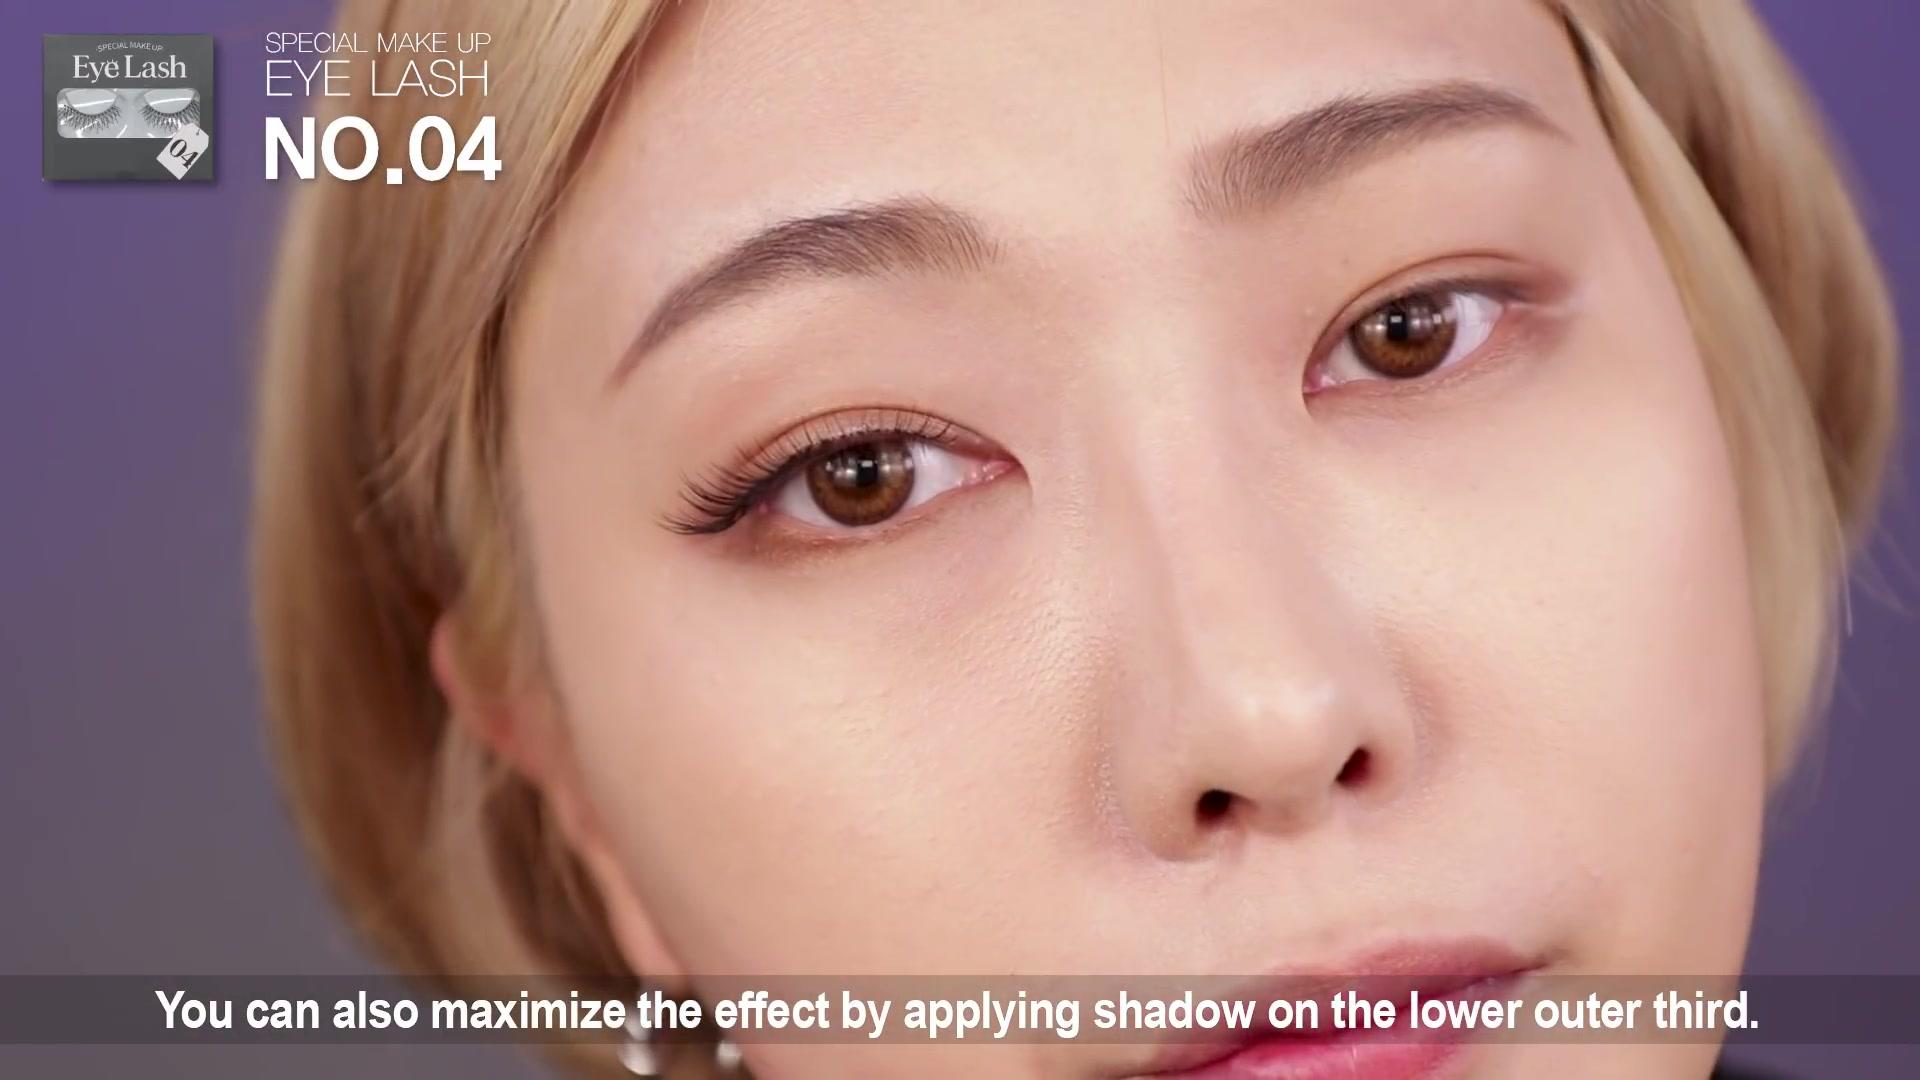 SSIN Episode 201: $1 Korean Daiso Eyelashes Review #2